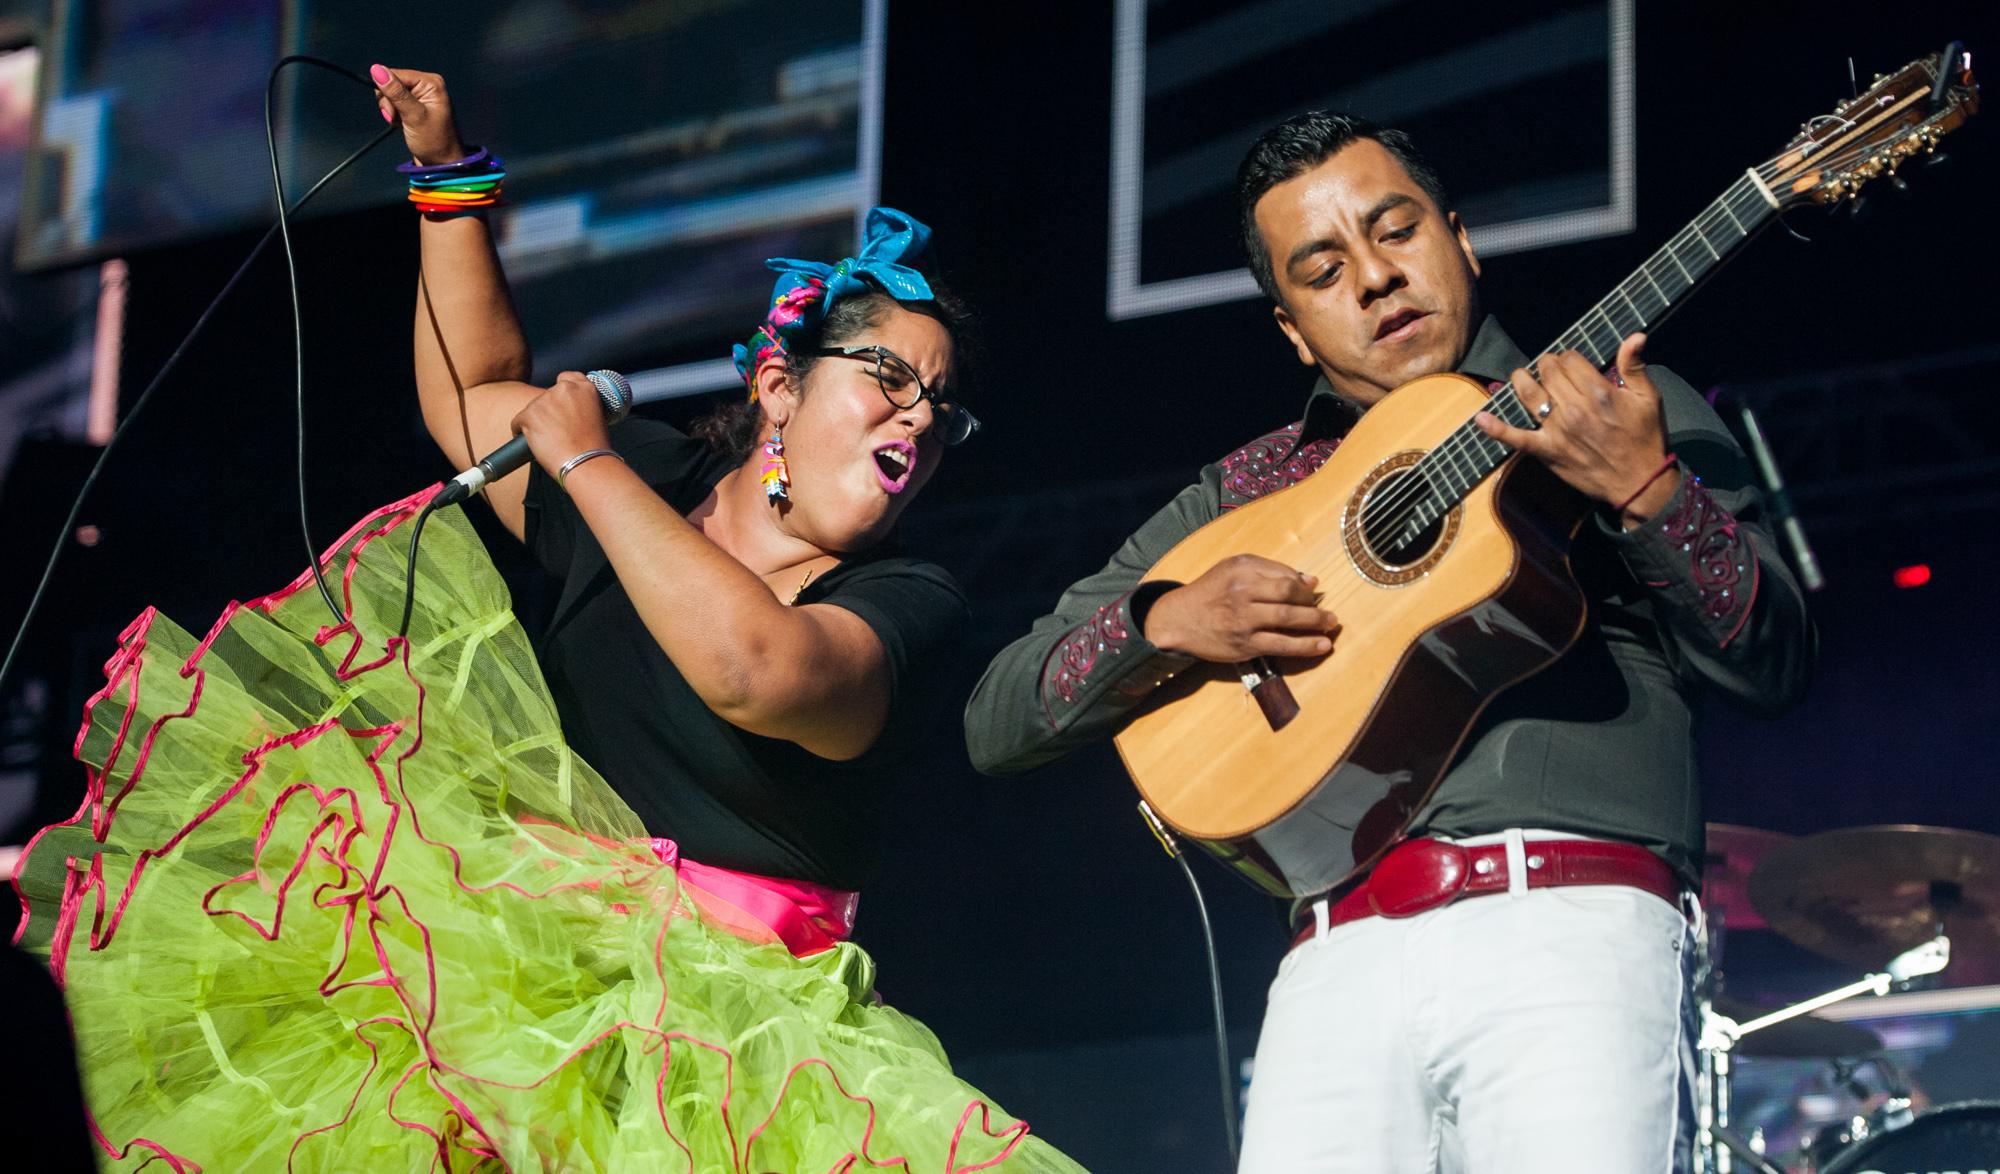 Marisol Hernandez and Jose Carlos of La Santa Cecilia @ Staples Center | 2014